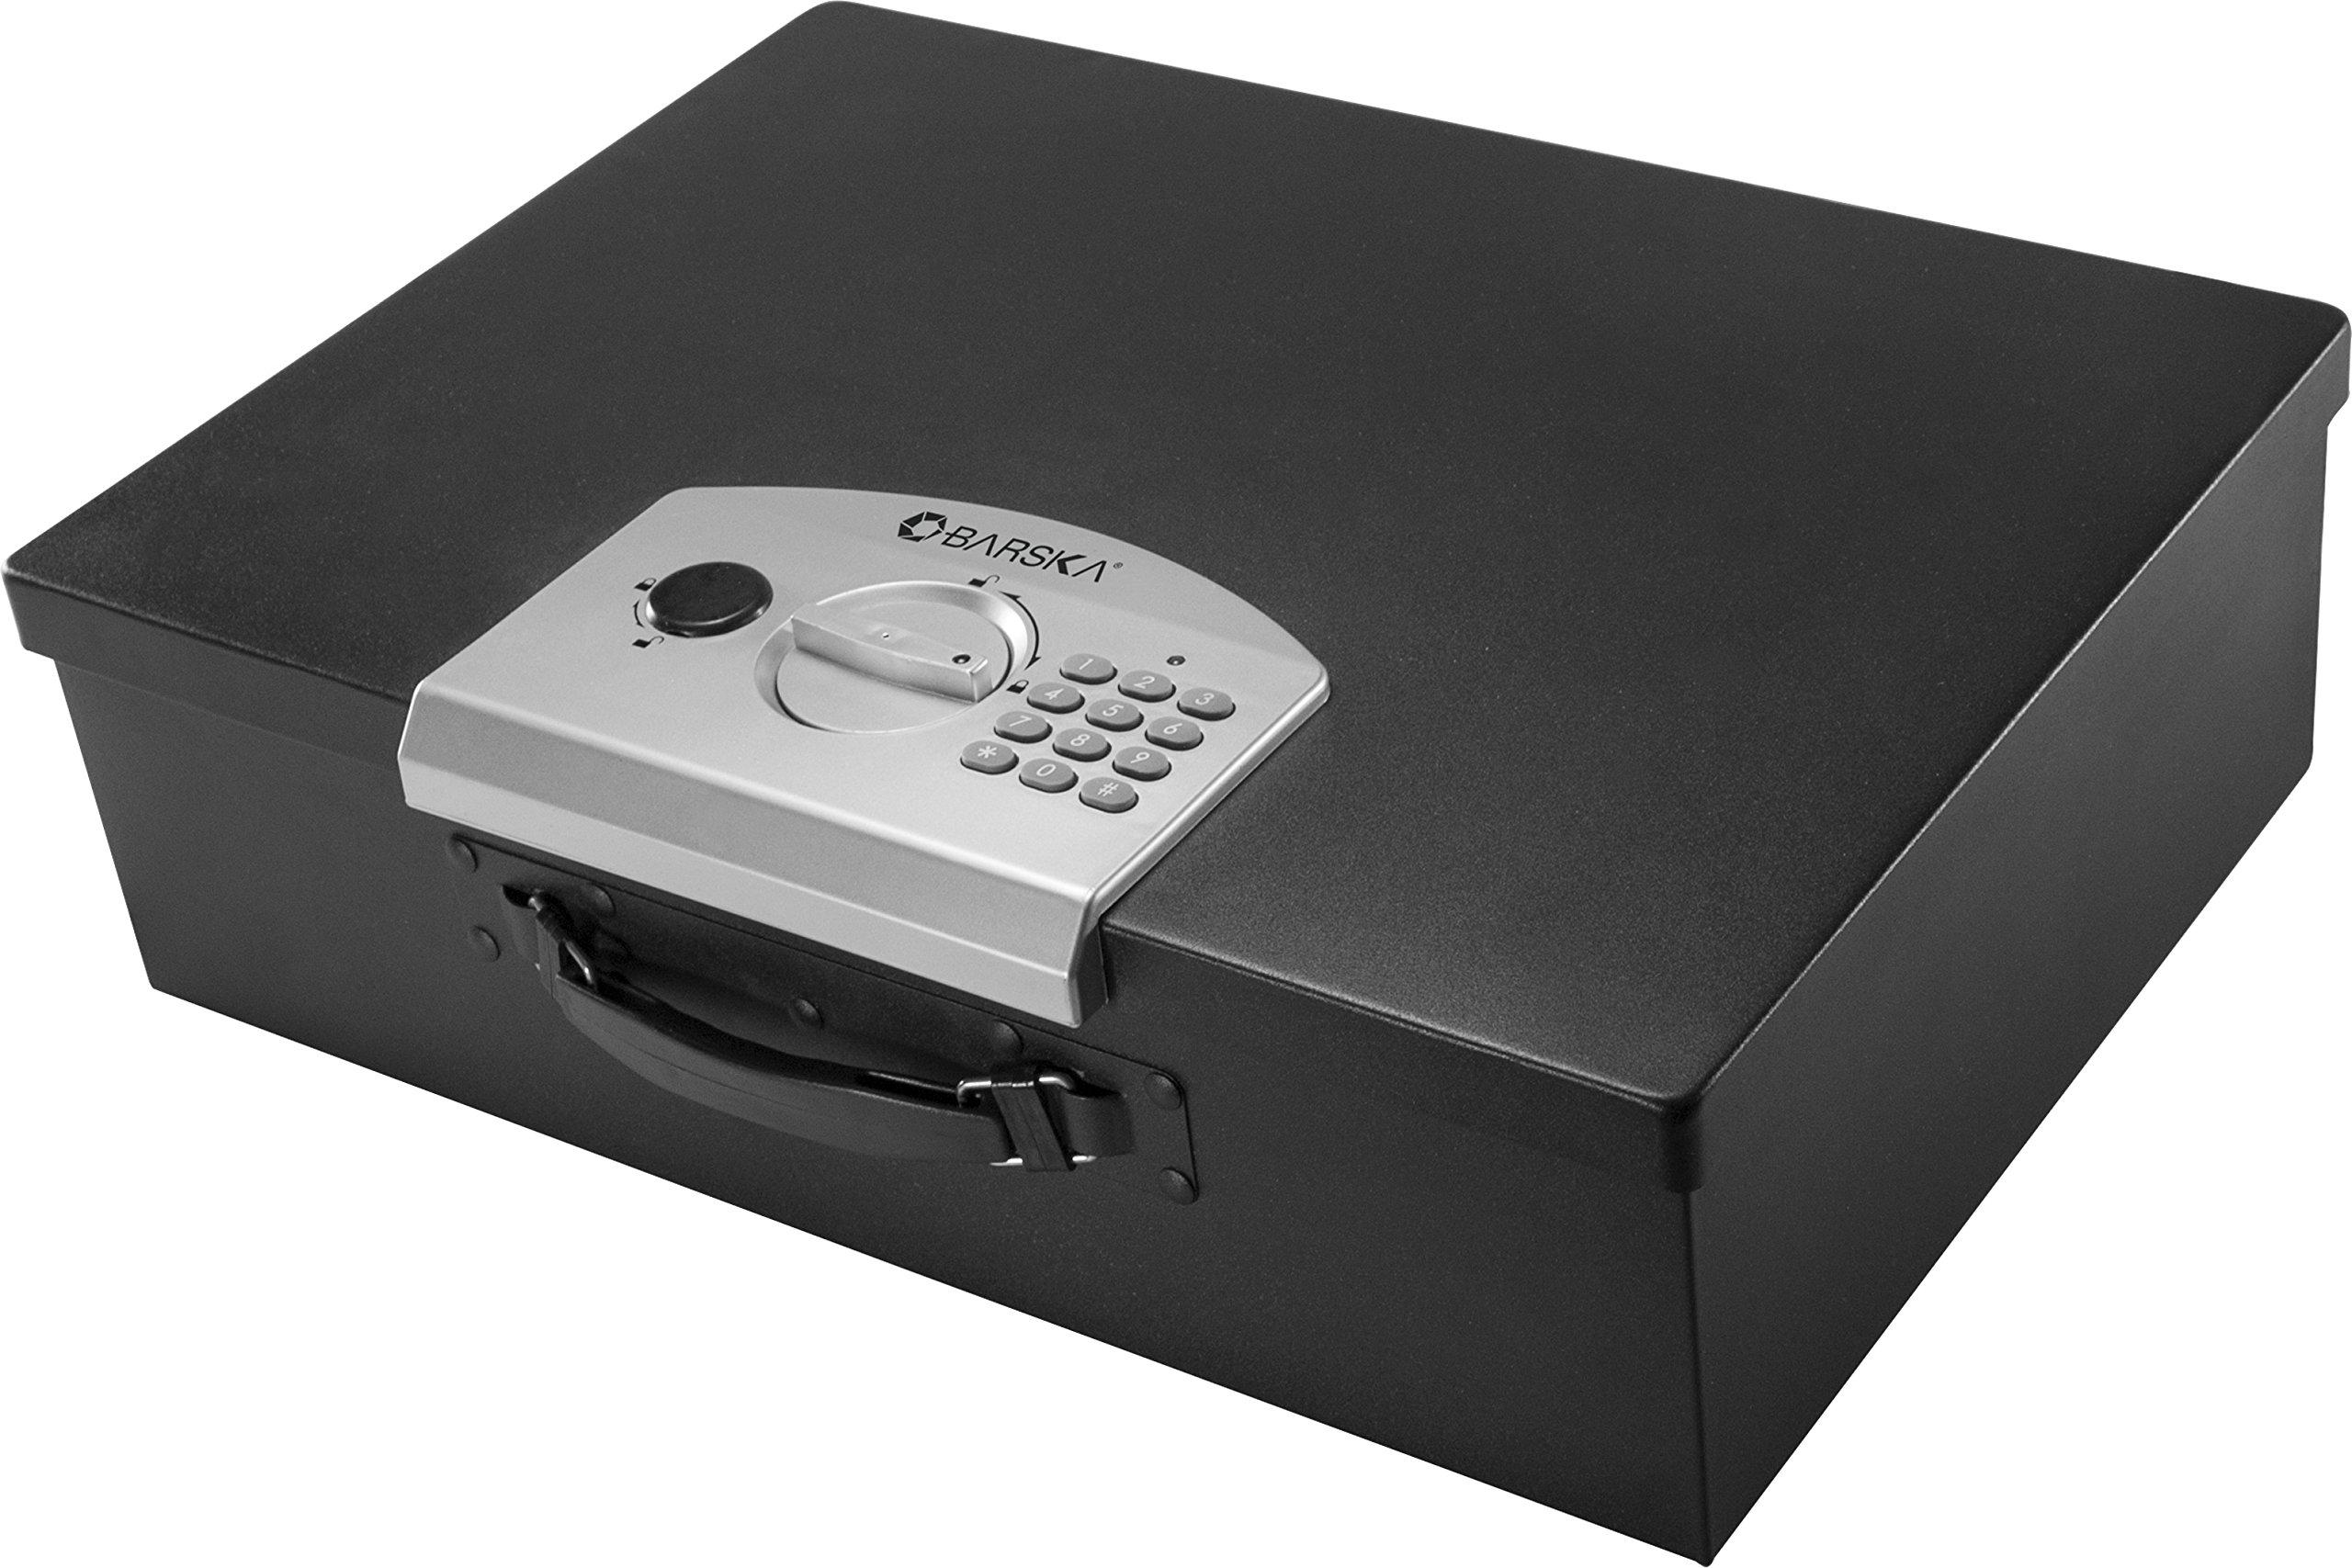 Portable Top Open Security Desk Drawer Safe Keypad Lock Box 17.5 in x 12.5 in x 5 in by BARSKA